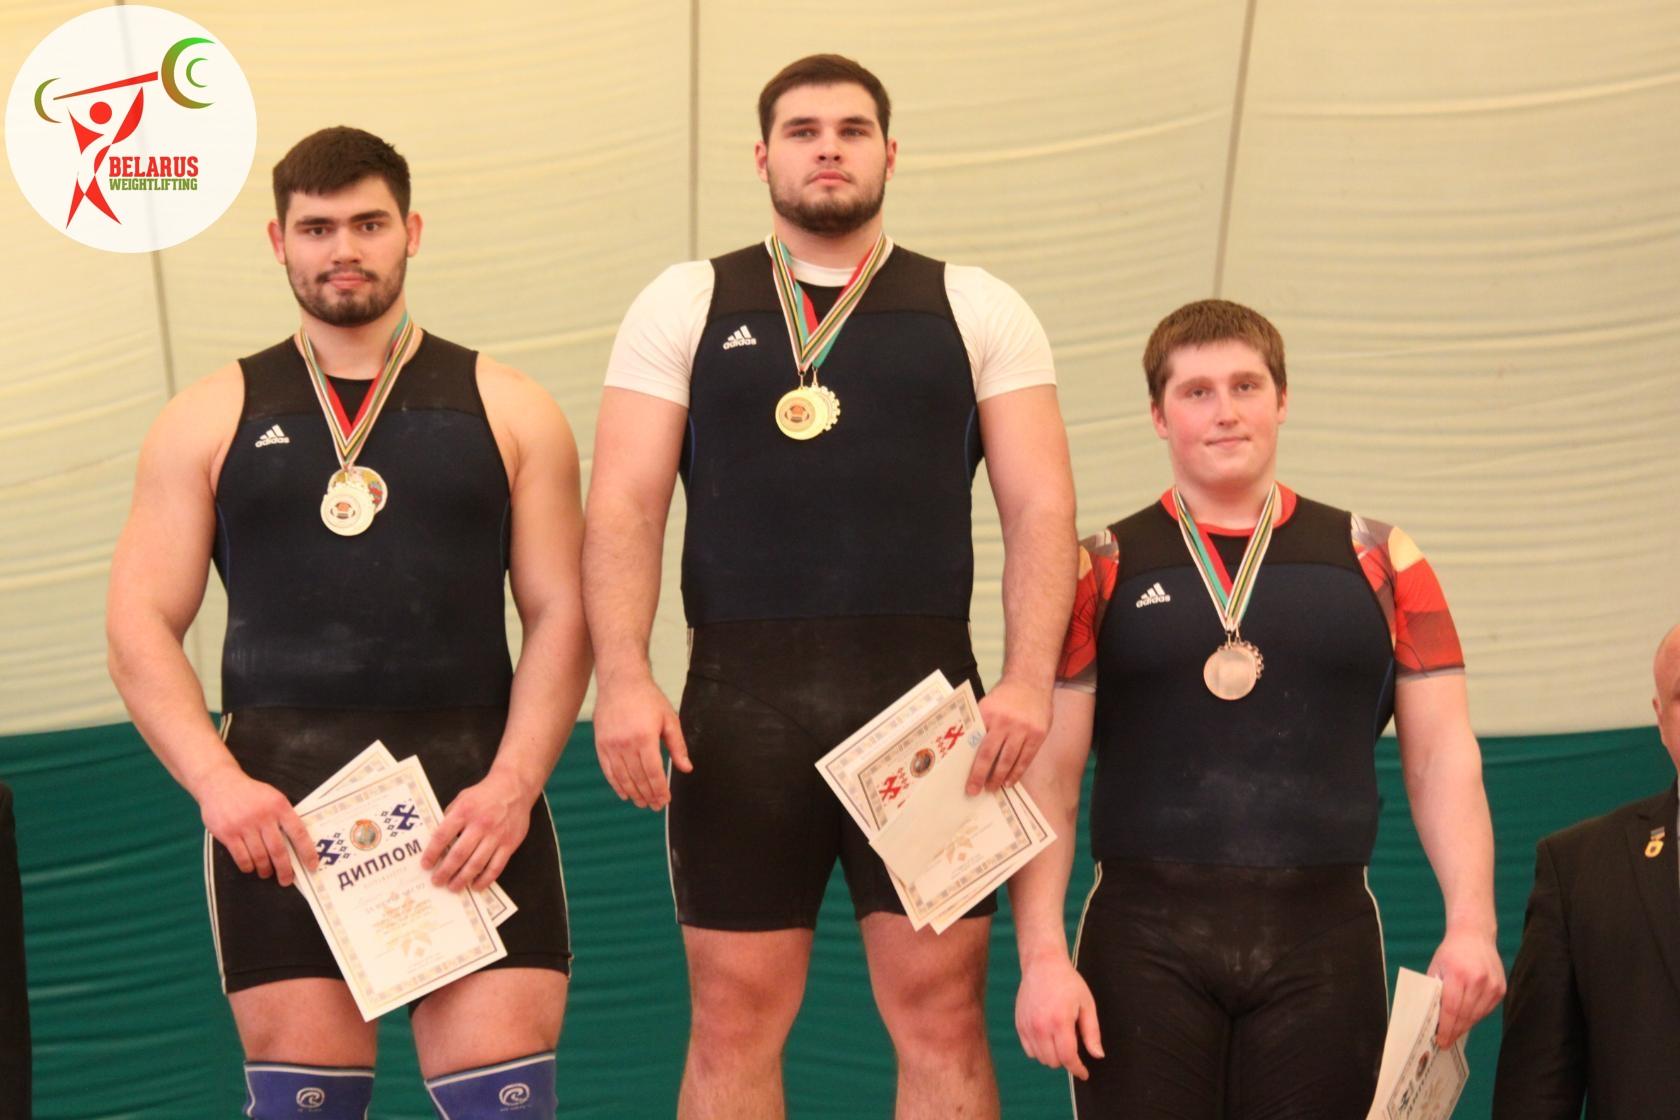 Alex Mzhachik, Eduard ZIAZIULIN, Ilya Lebedev